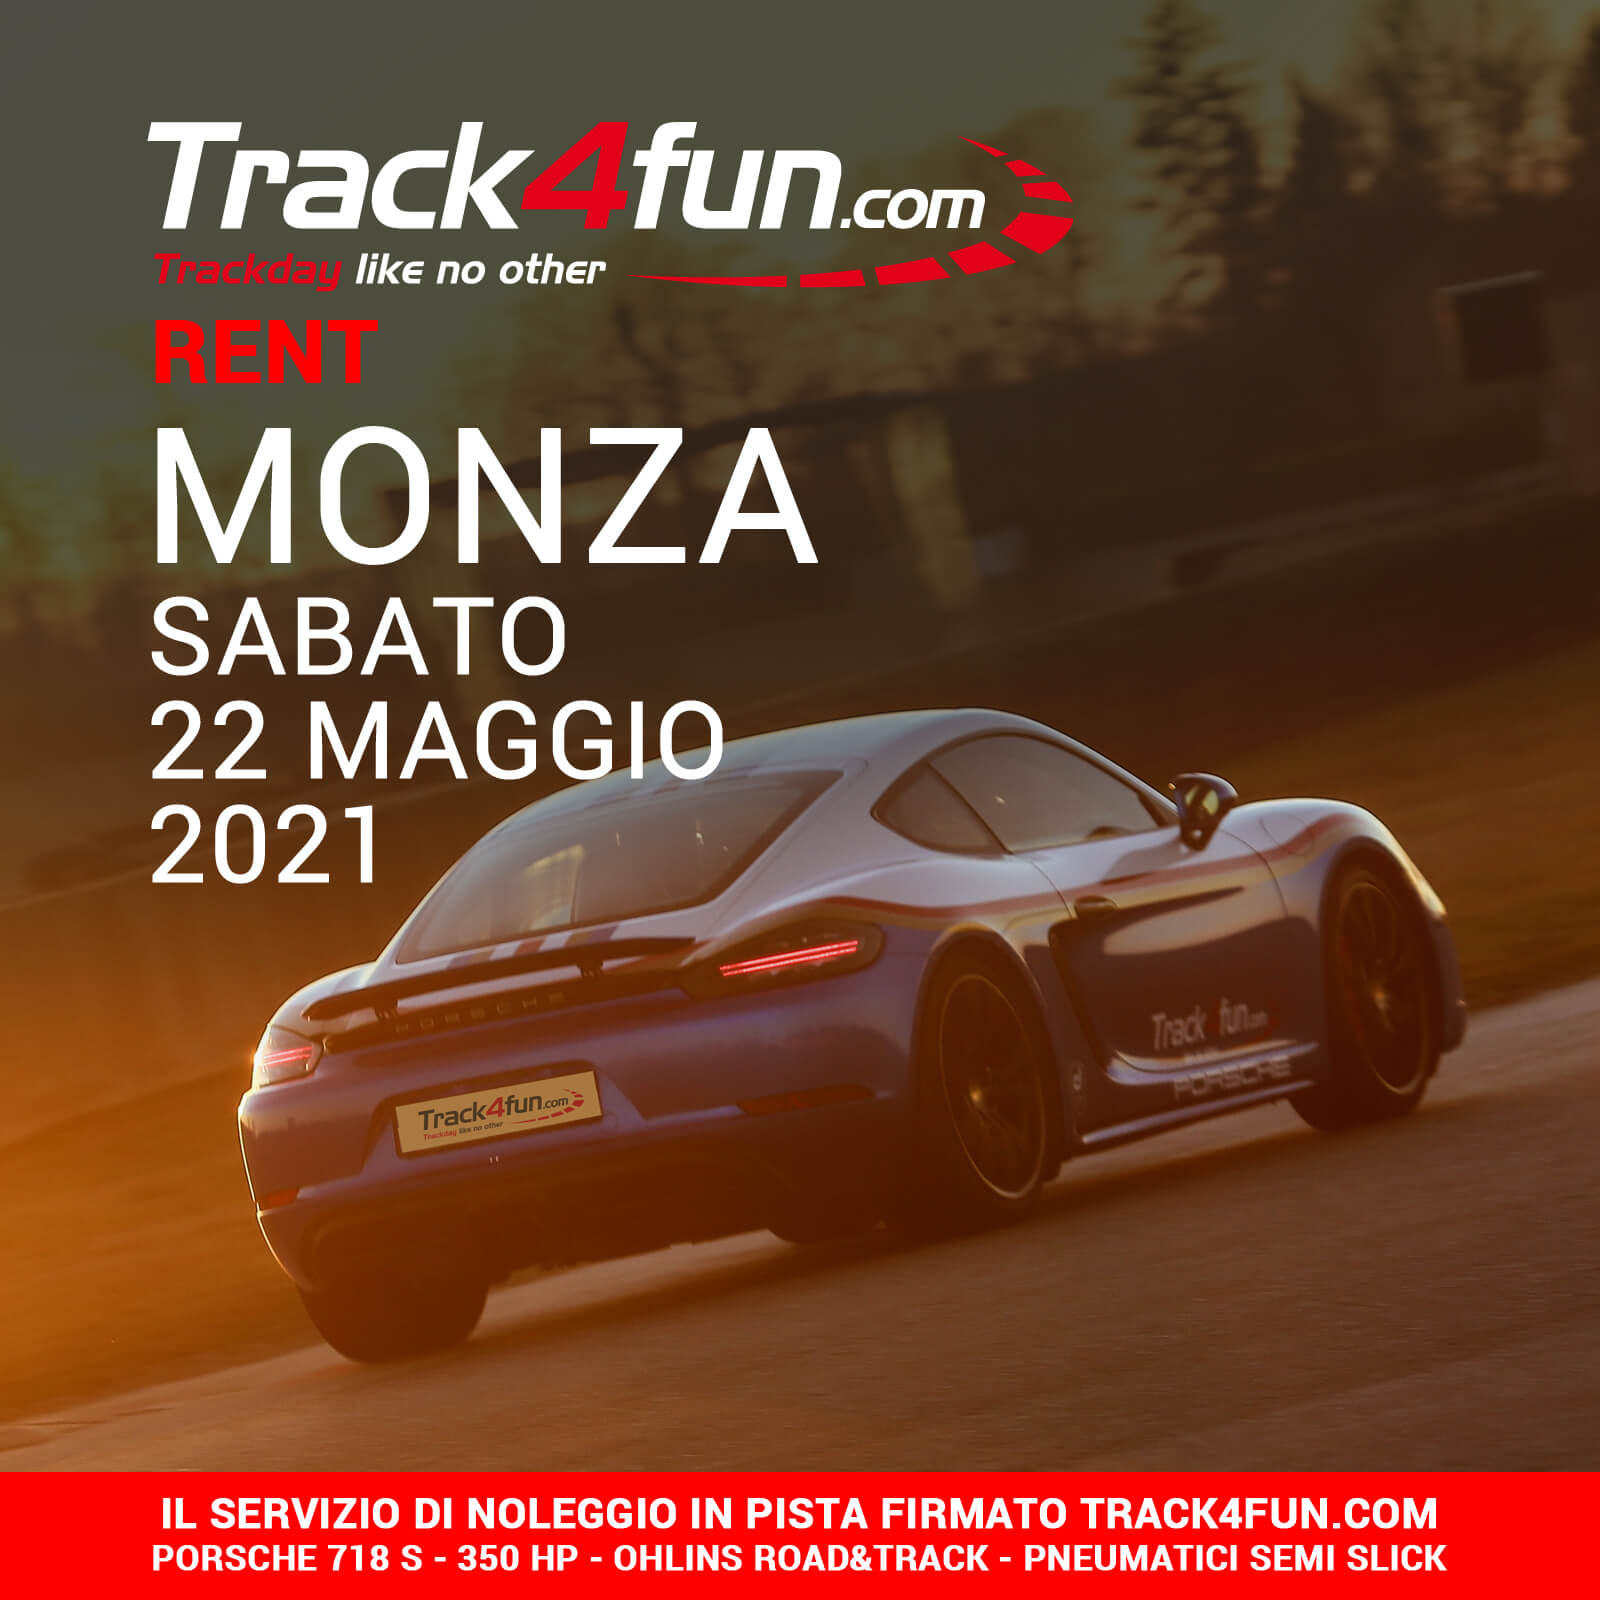 Track4fun Rent Monza 22-05-2021